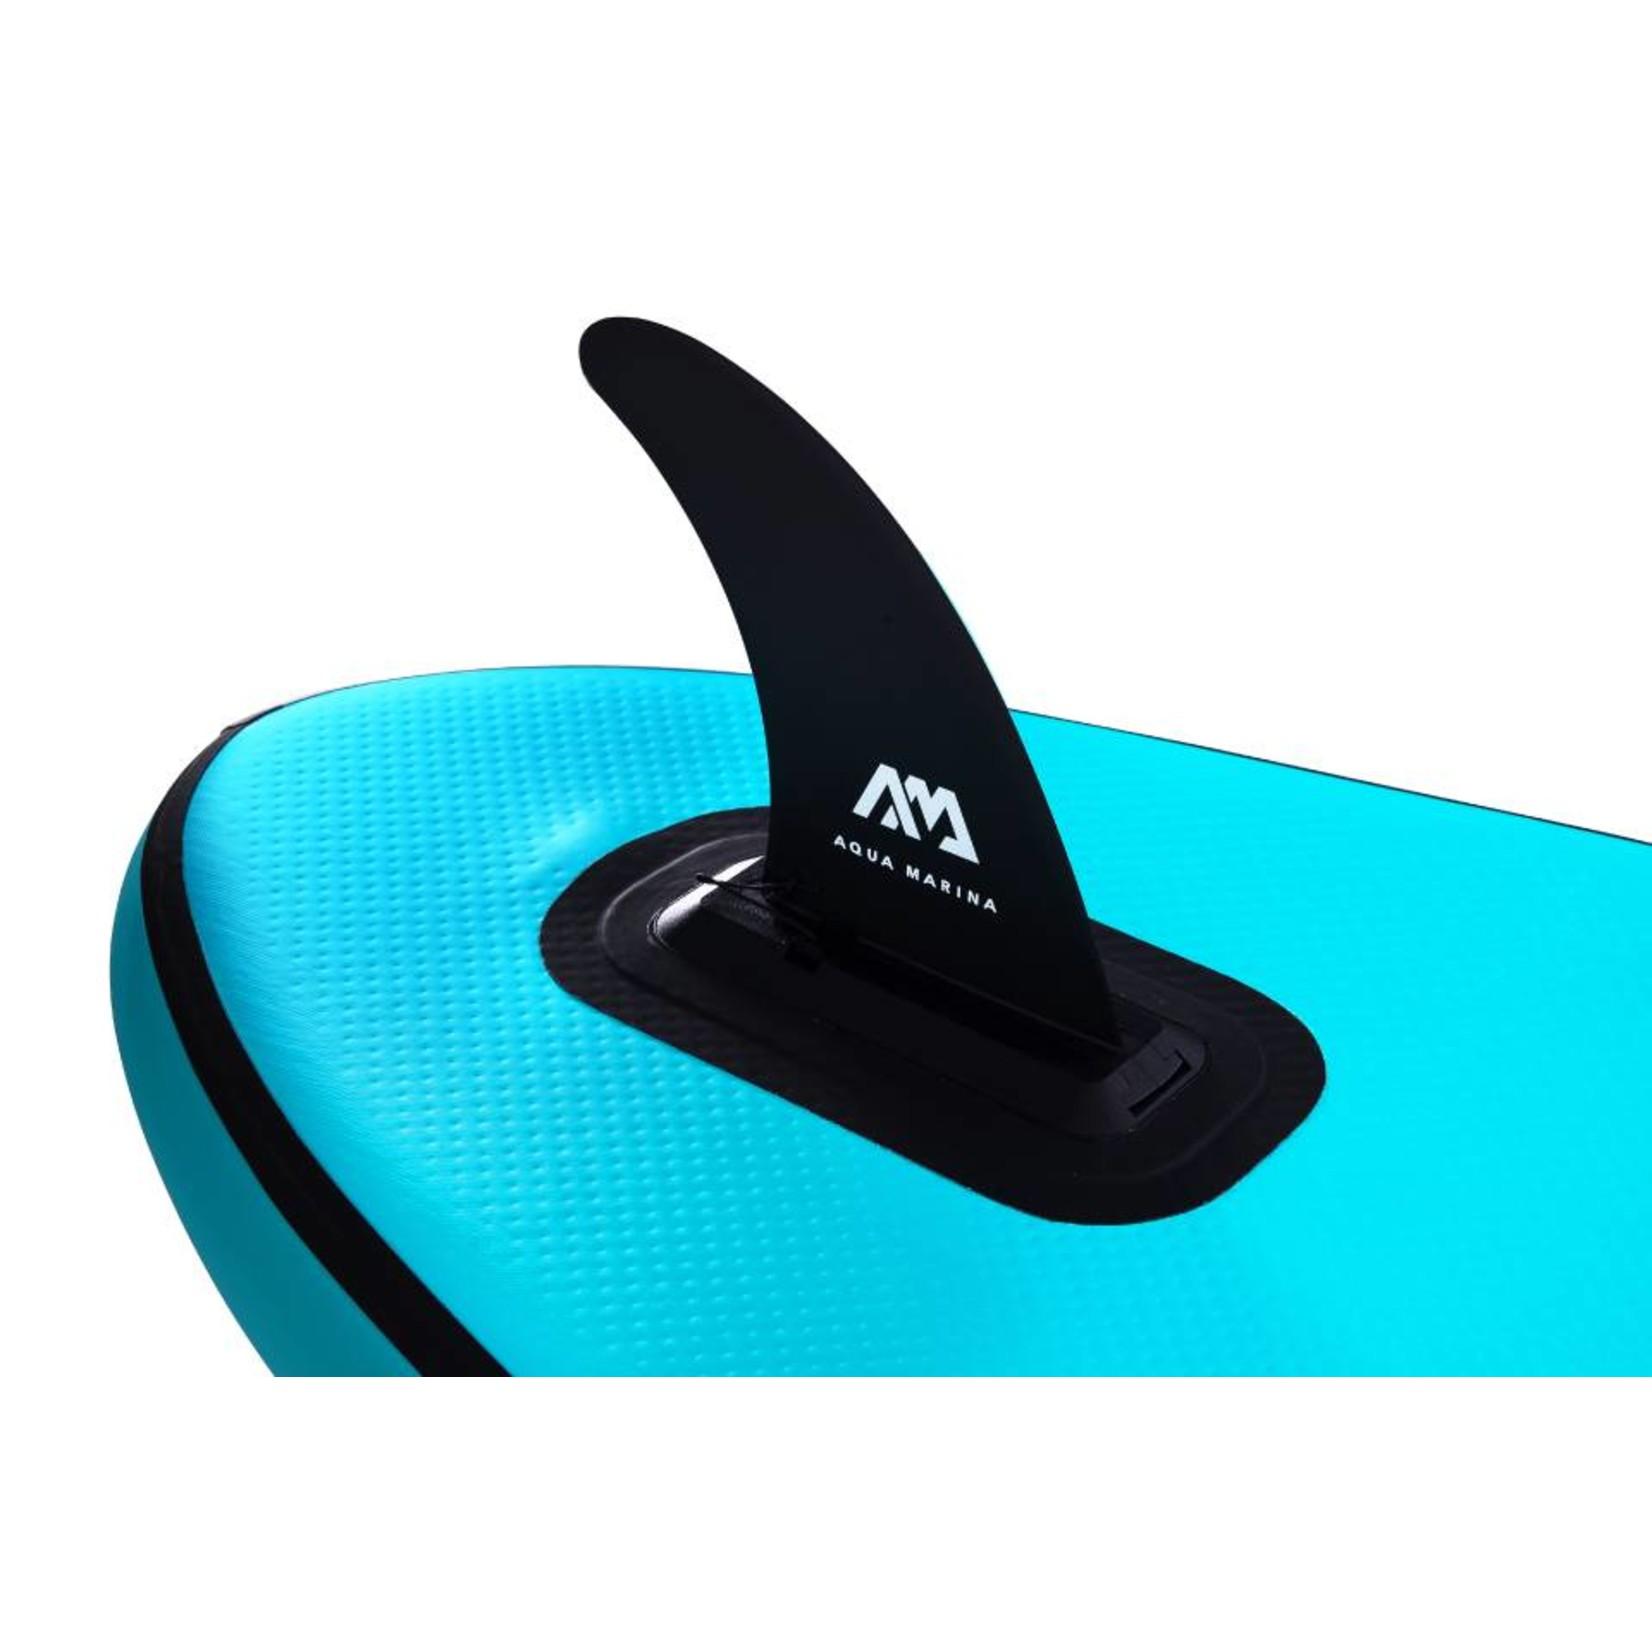 Aqua Marina All Round Vapor - Opblaasbaar Peddel Board